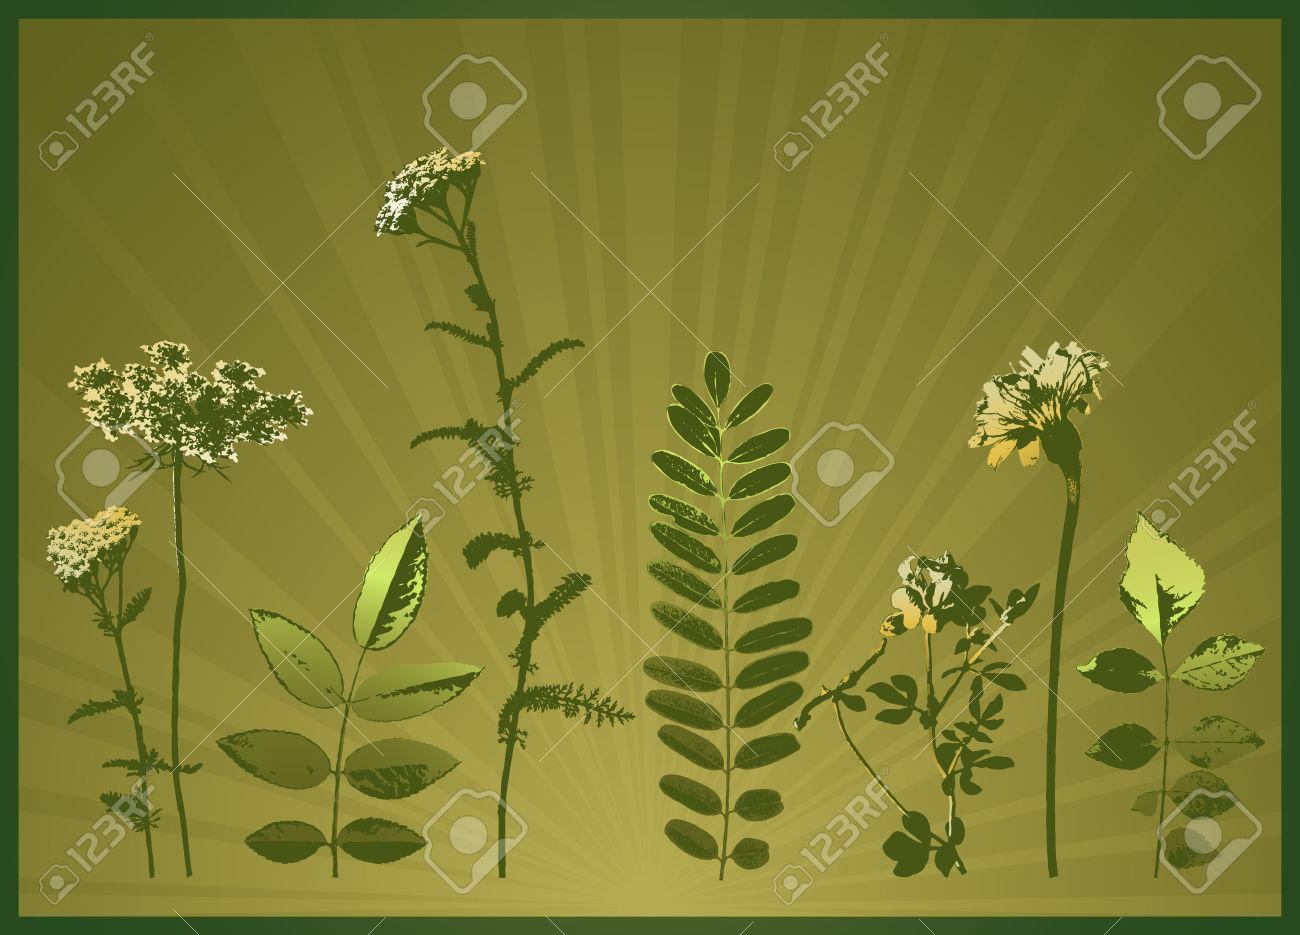 Modern, Season, Summer, Vector, Yellow, Spring, Floral, Style.